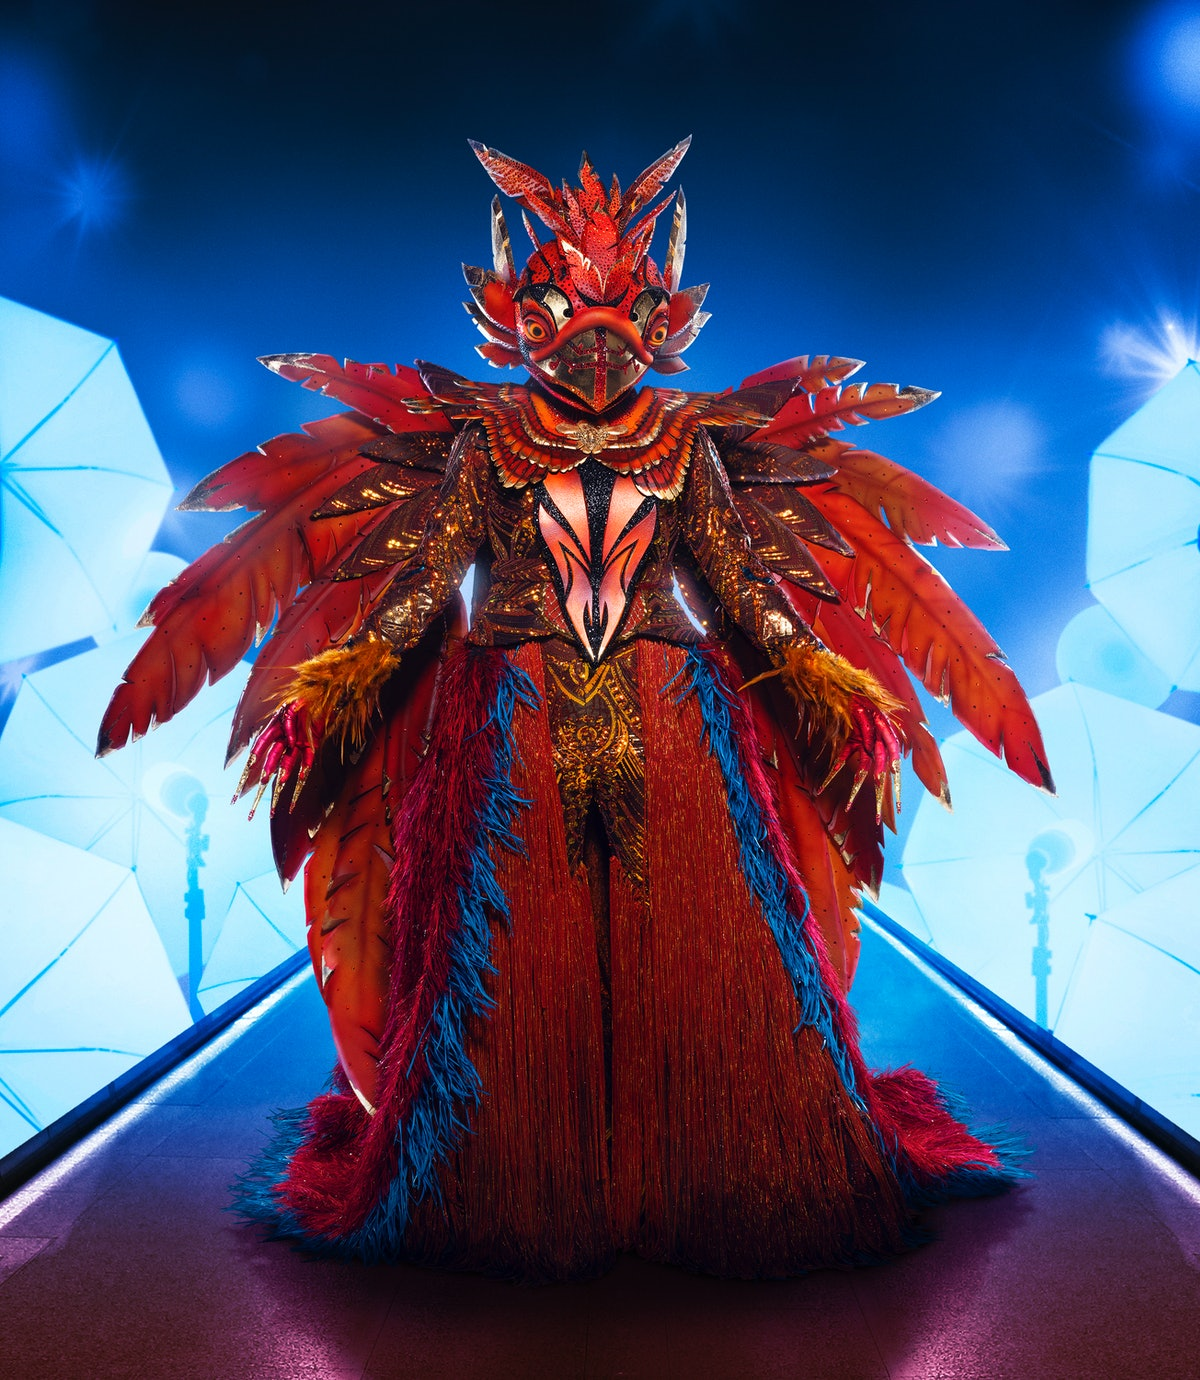 Phoenix on The Masked Singer